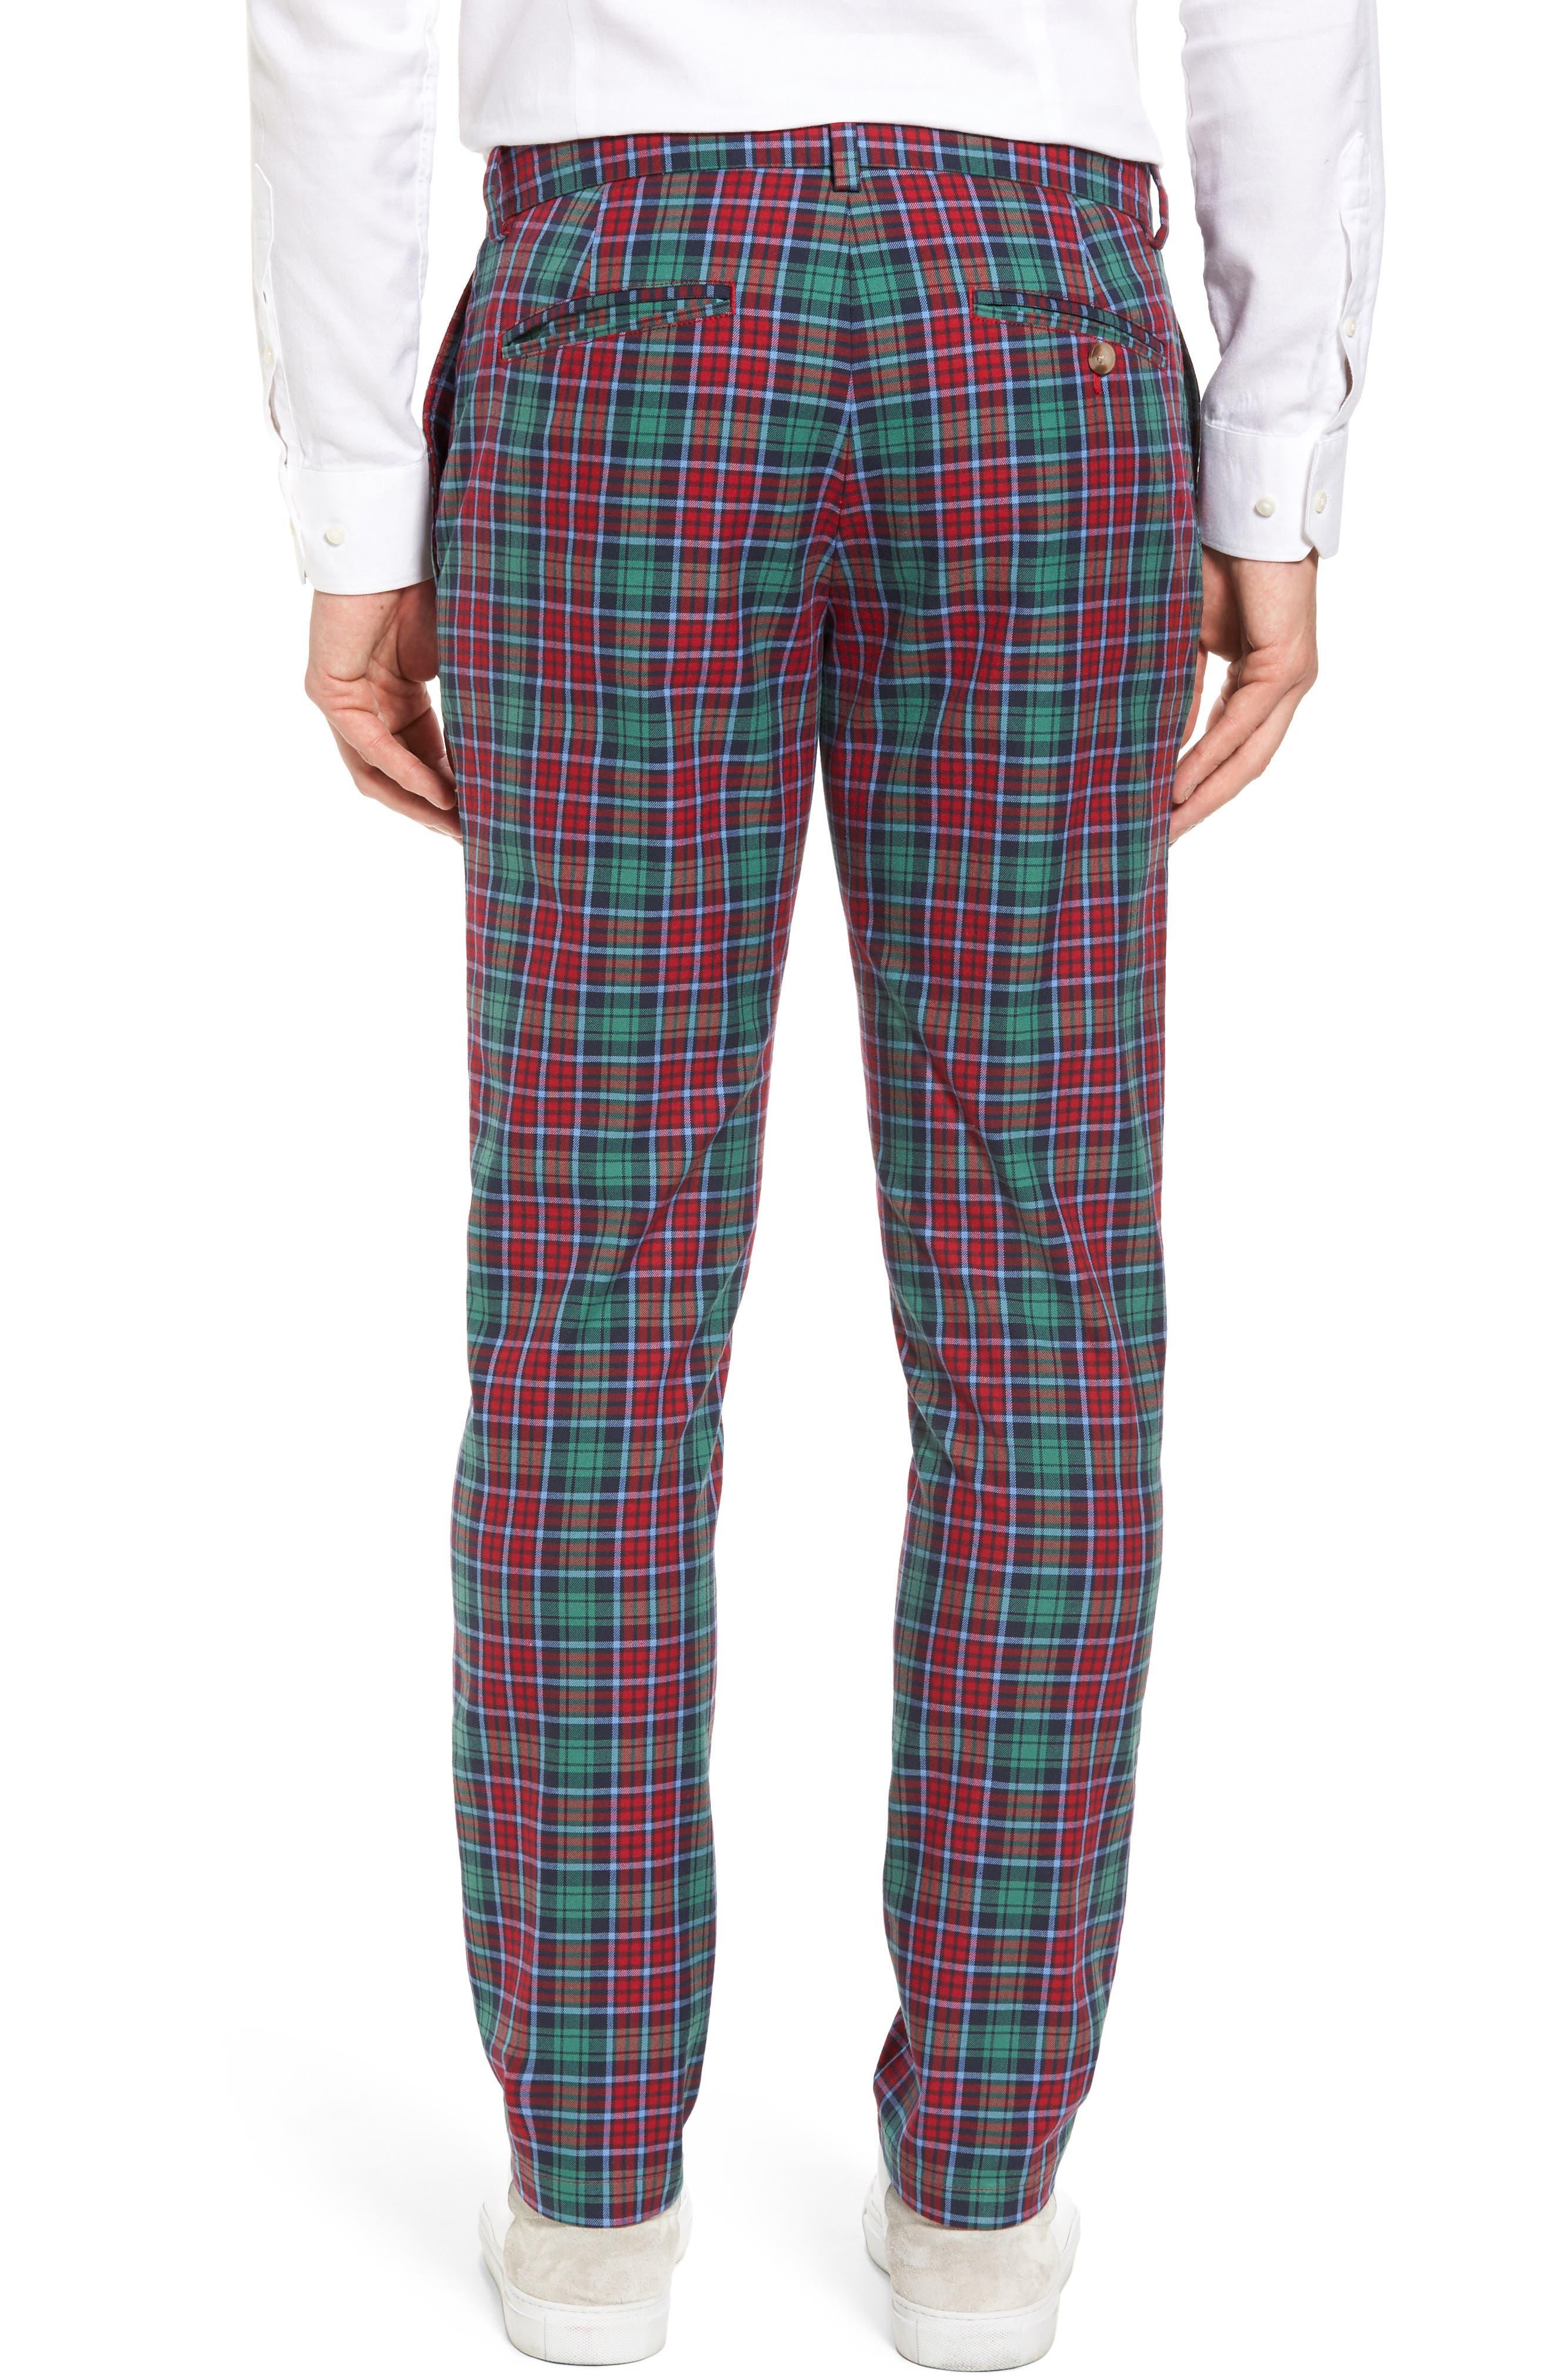 Leddy Park Slim Plaid Pants,                             Alternate thumbnail 2, color,                             342